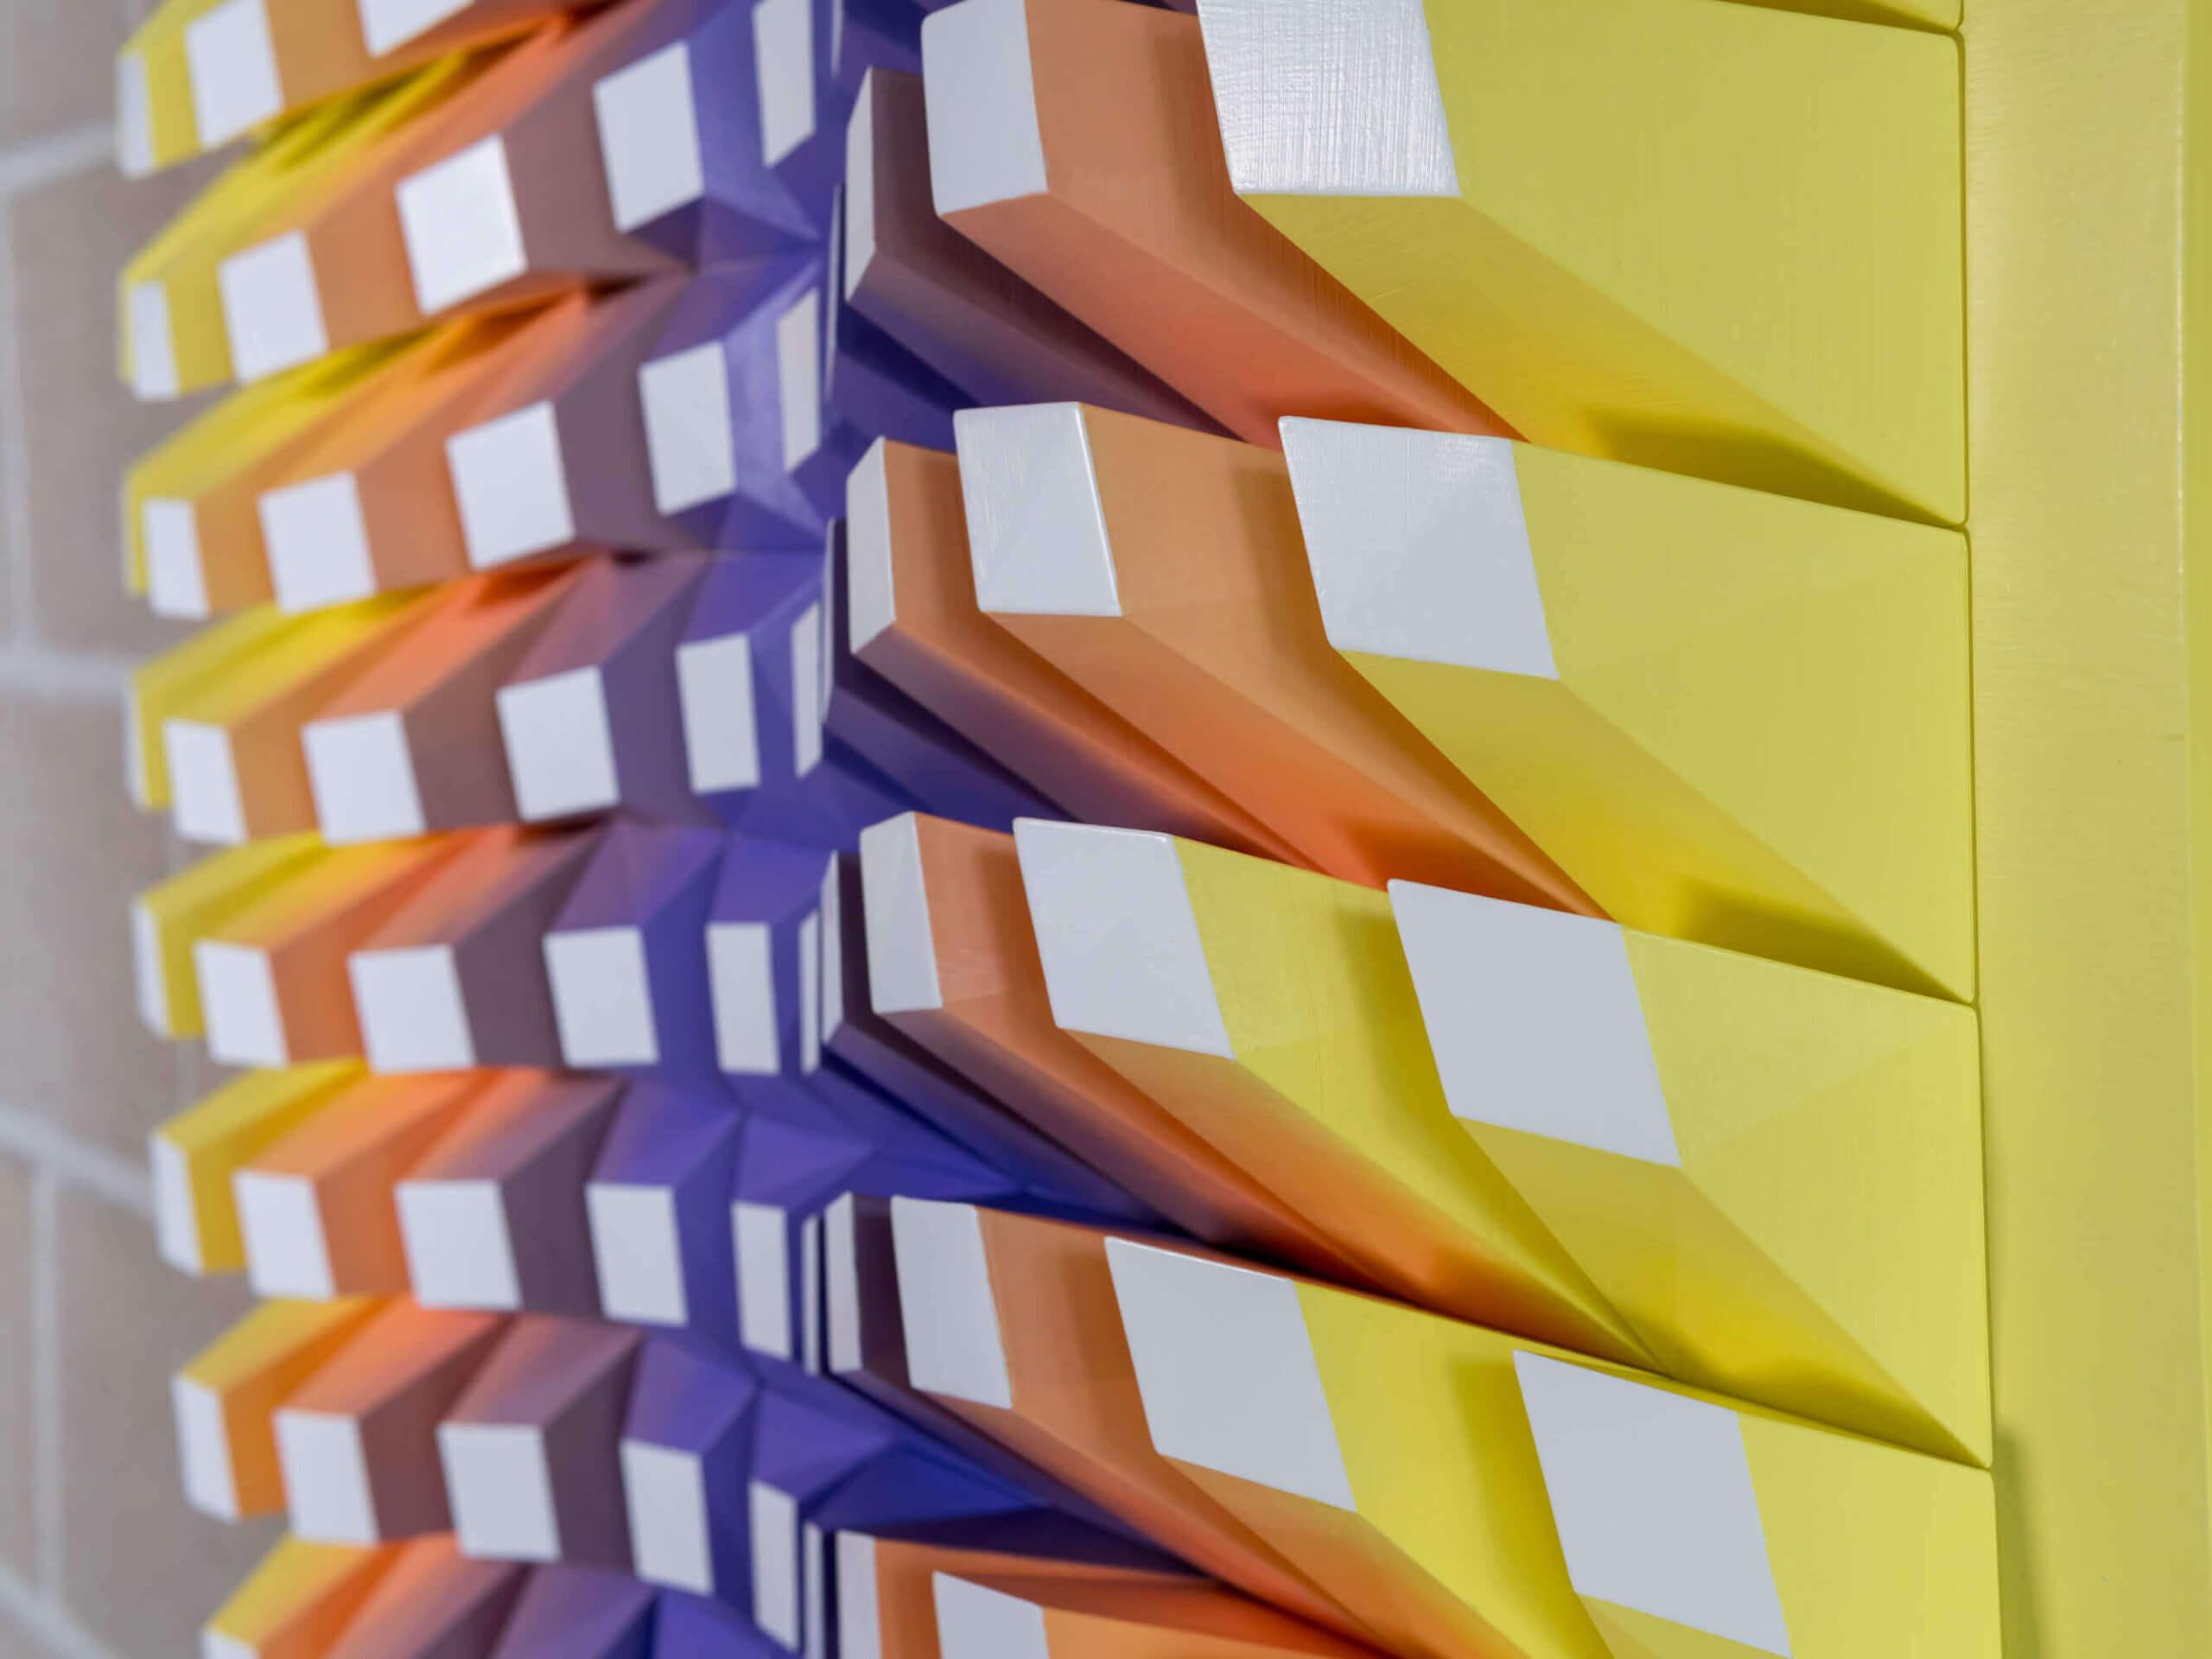 Detail of 'Matrix of Life 100' Wall Sculpture 72x72x8,5 cm/ 28.3x28.3x3.3 inch.